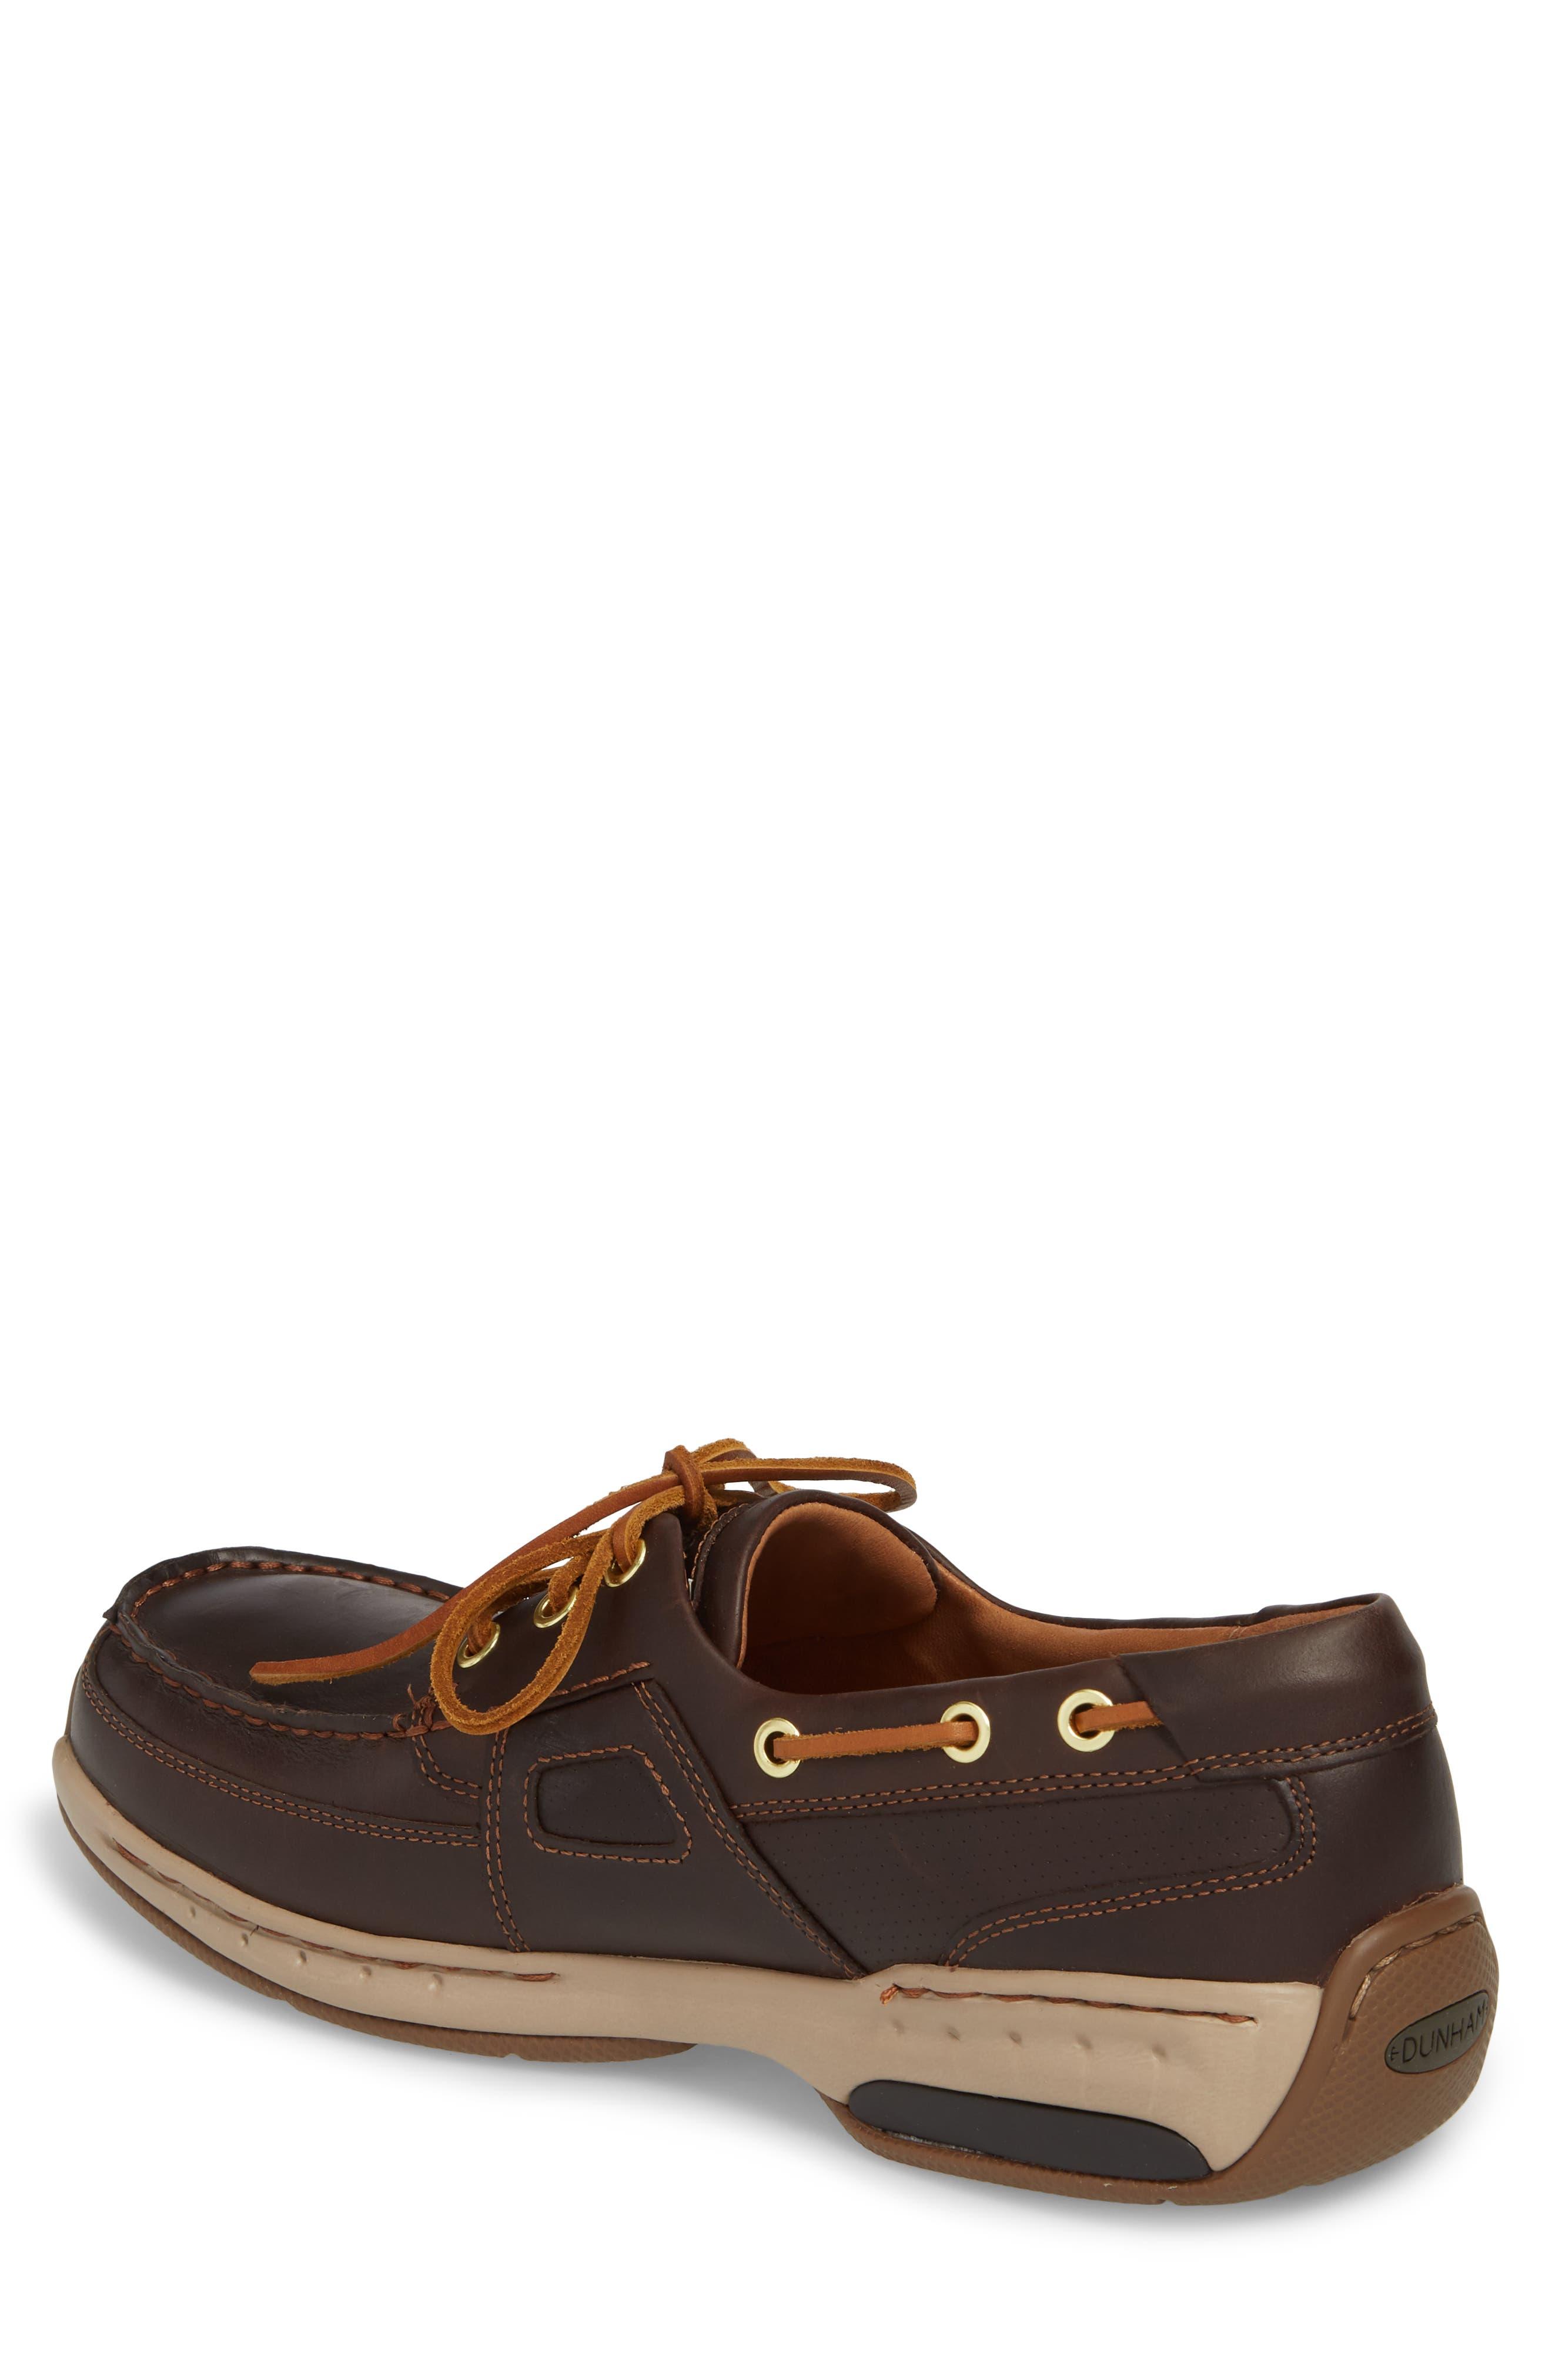 LTD Water Resistant Boat Shoe,                             Alternate thumbnail 2, color,                             Tan Leather